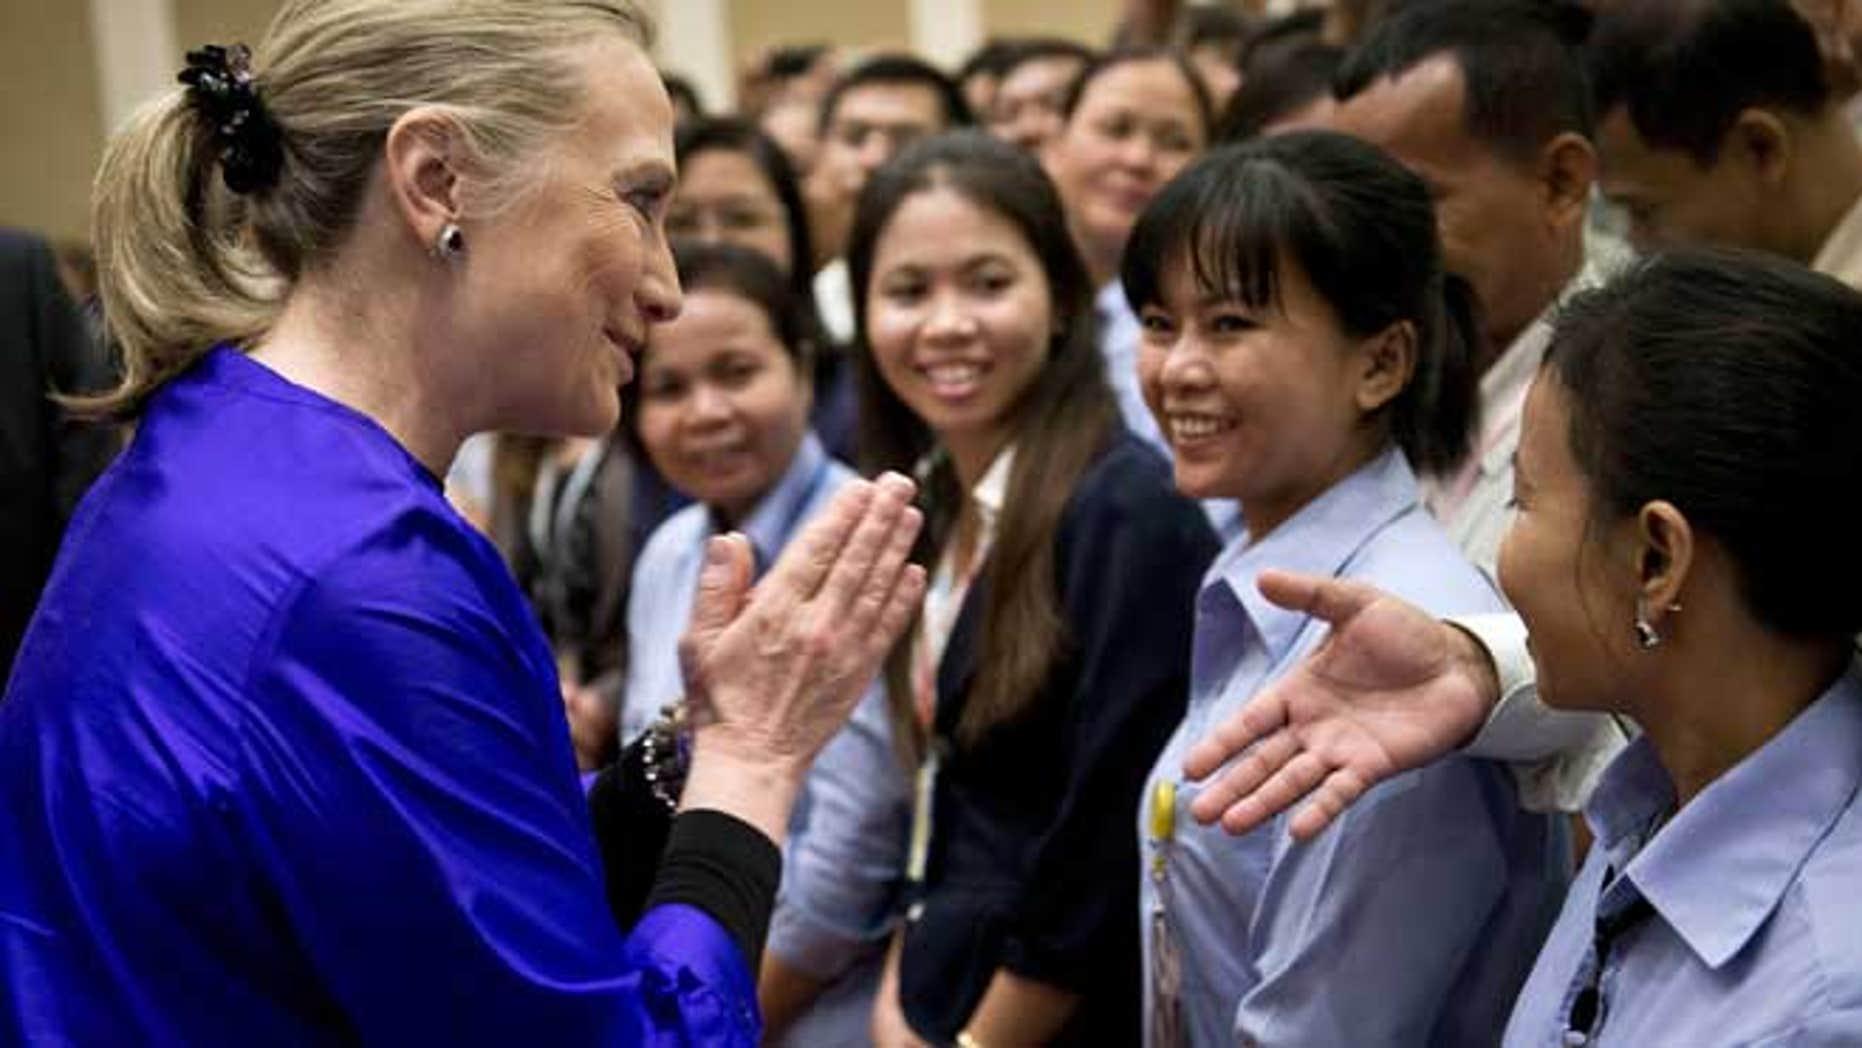 July 13, 2012: U.S. Secretary of State Hillary Rodham Clinton, left, greets U.S. Embassy staff at the Le Royal hotel in Phnom Penh, Cambodia.